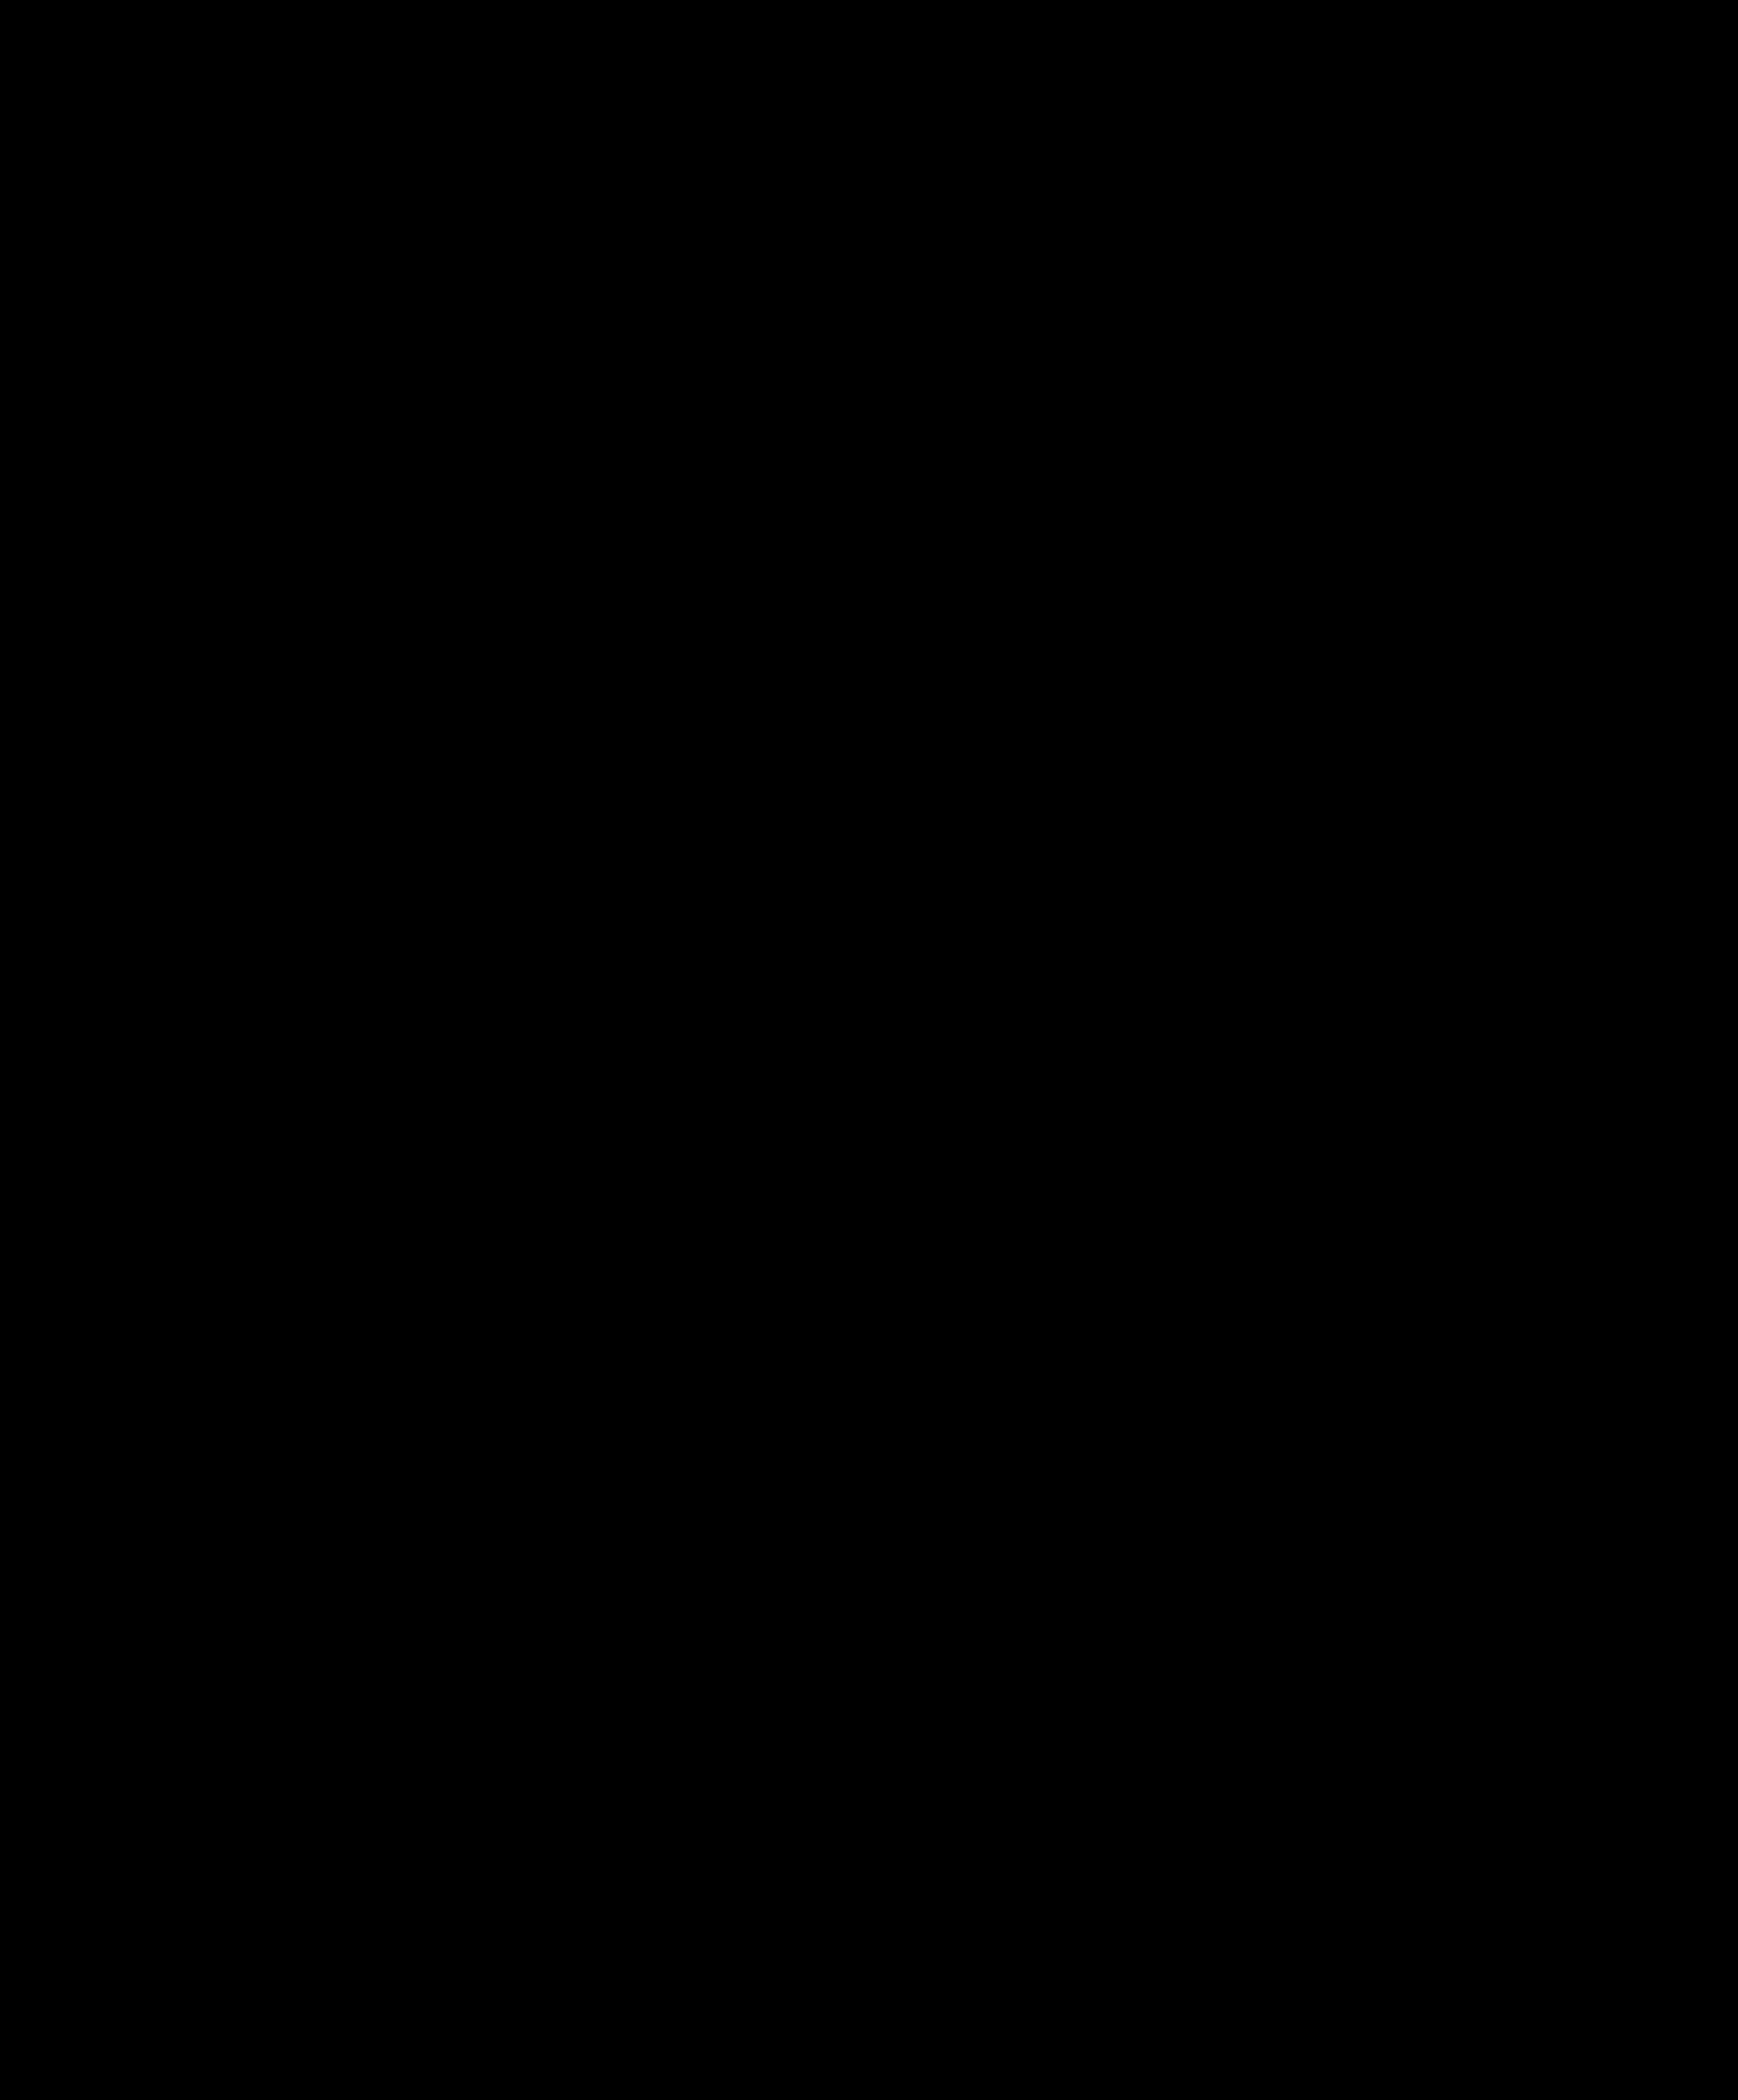 Soccer silhouette clip art. Football clipart goalie